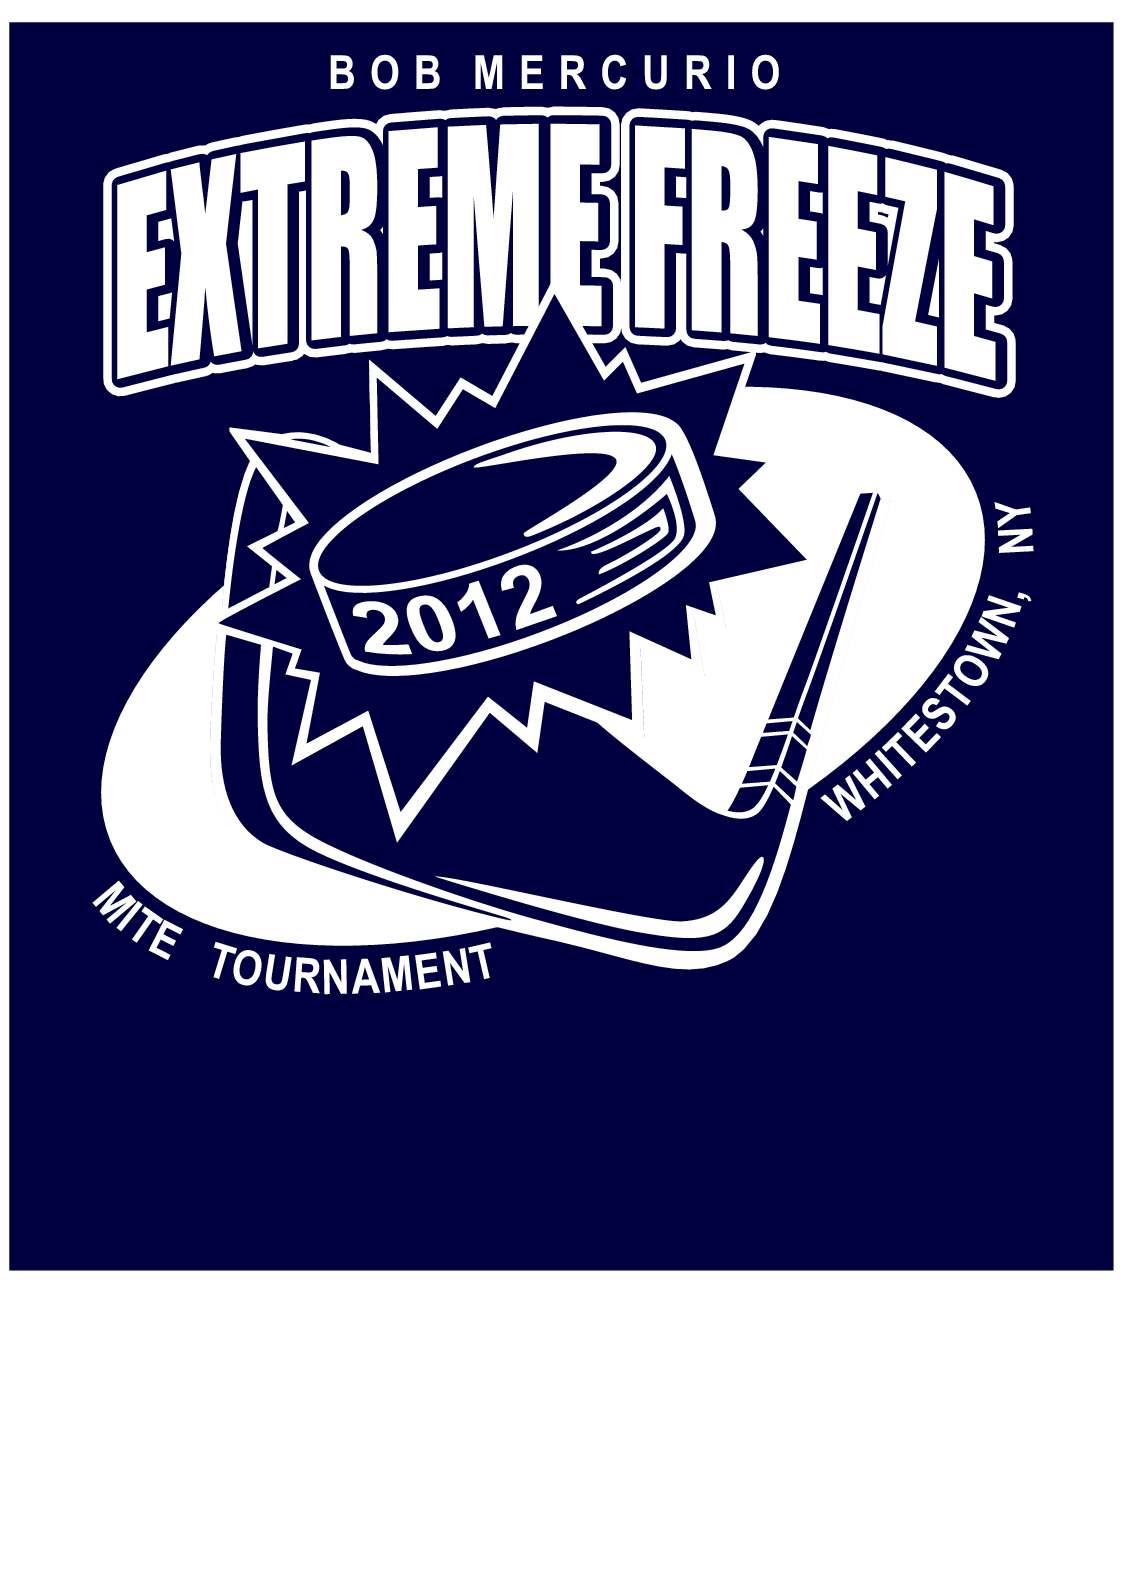 Bob Mercurio Extreme Freeze Mite Tournament